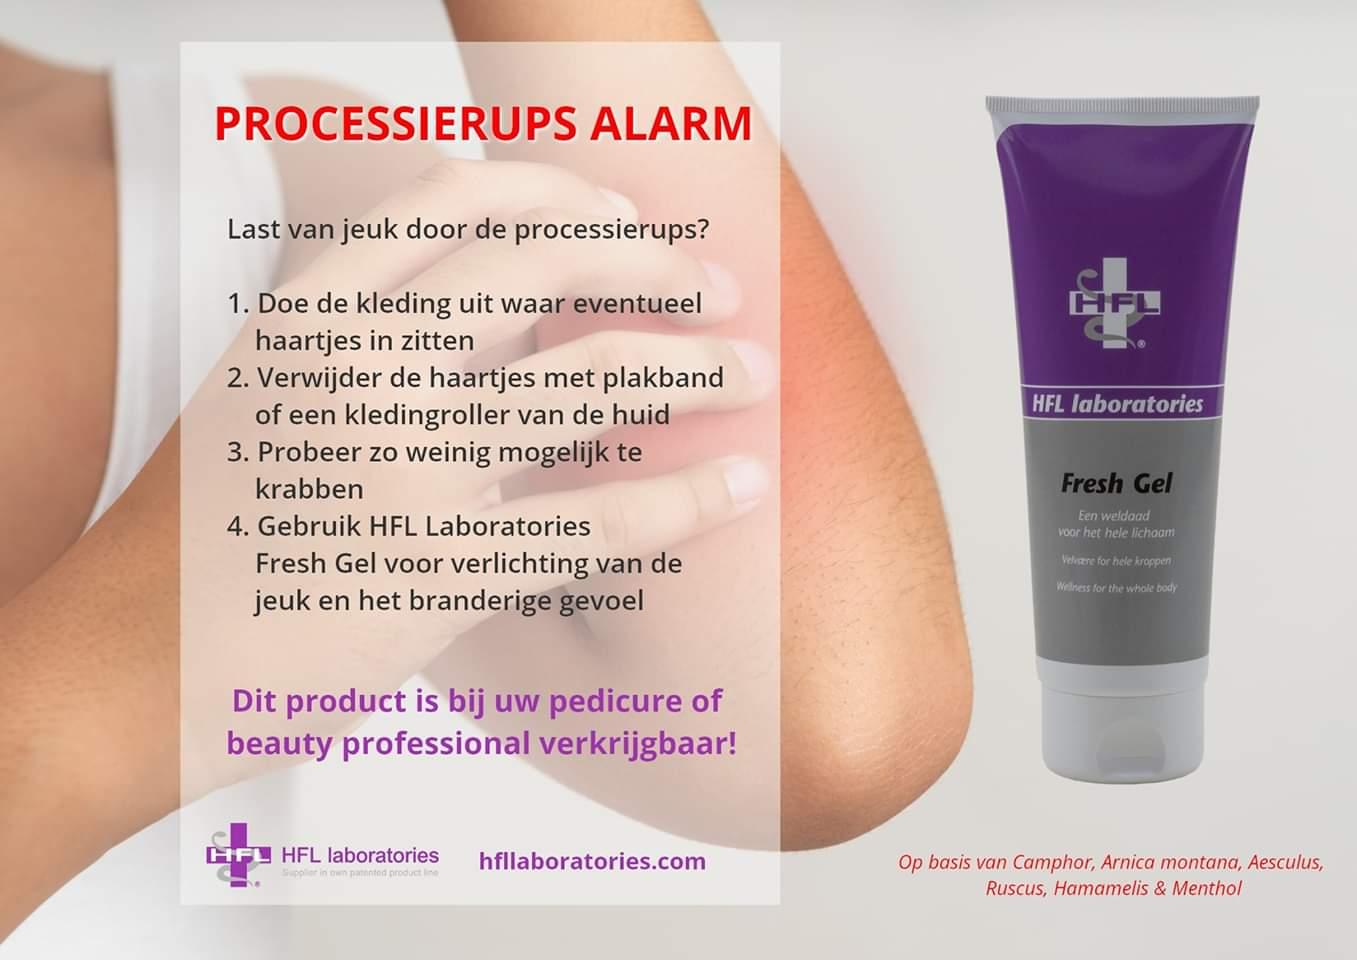 Processierups Alarm